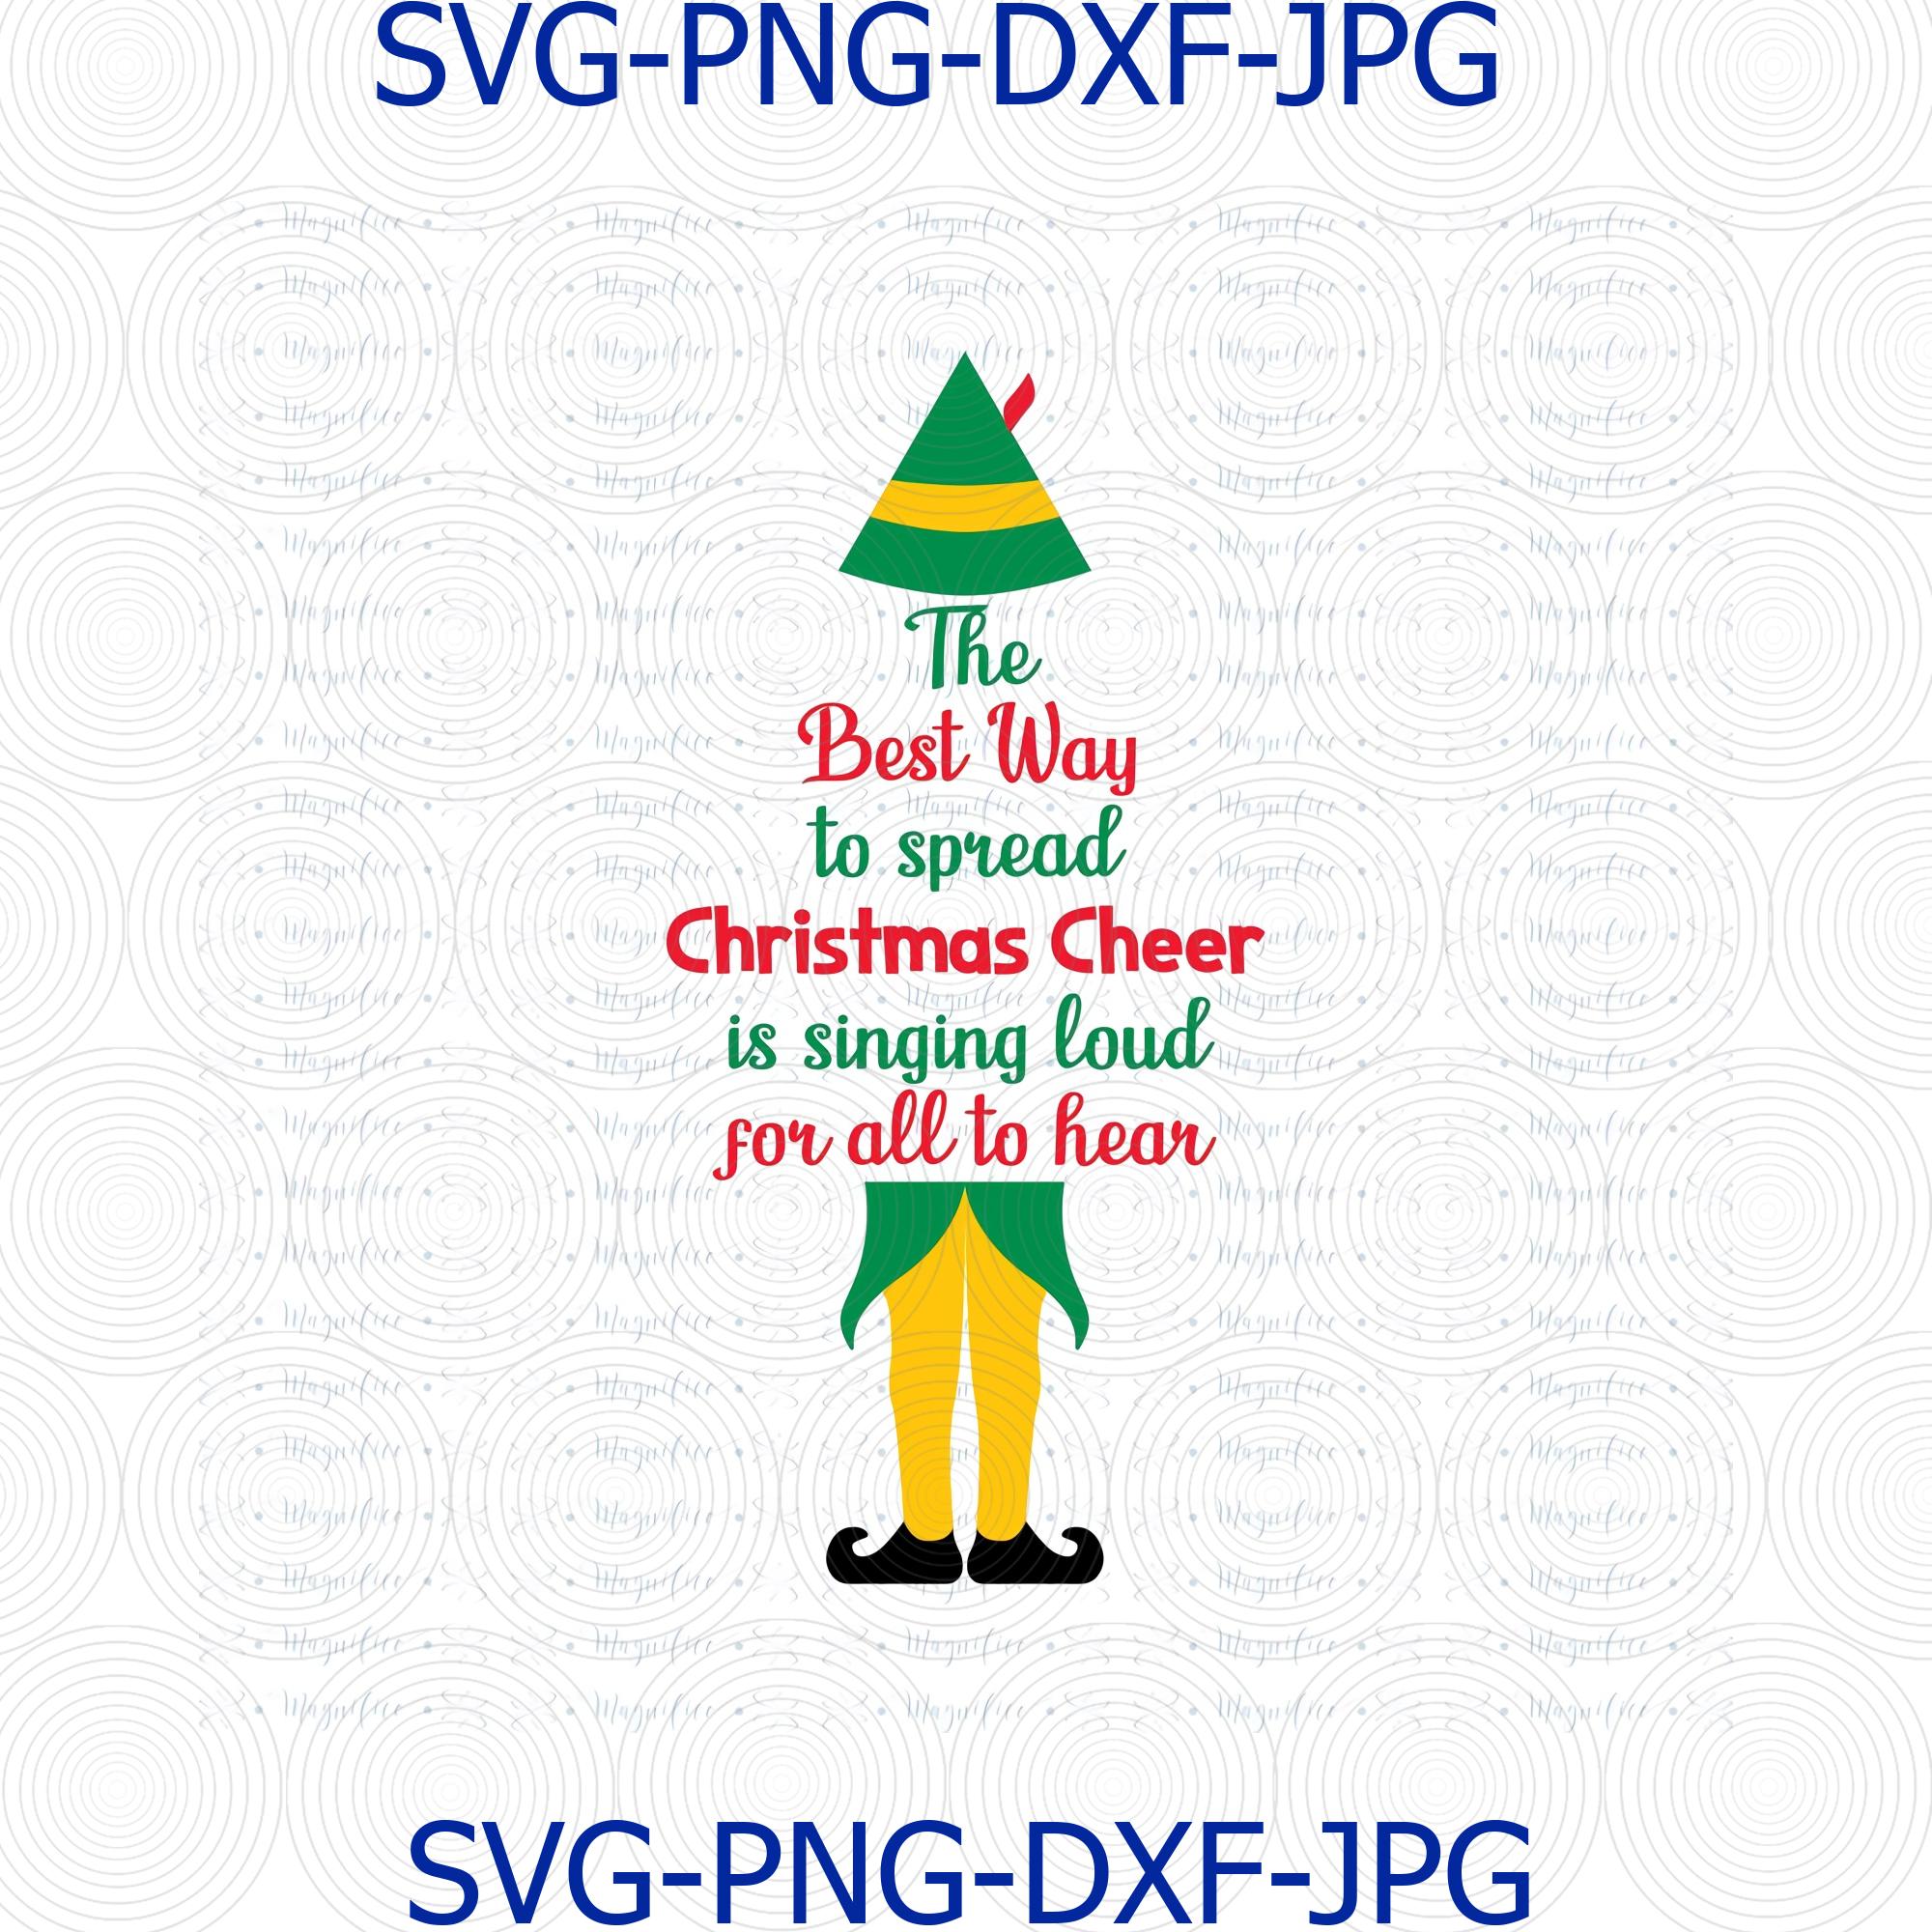 Buddy Elf Svg Christmas Cheer The Best Way To By Digital4u On Zibbet